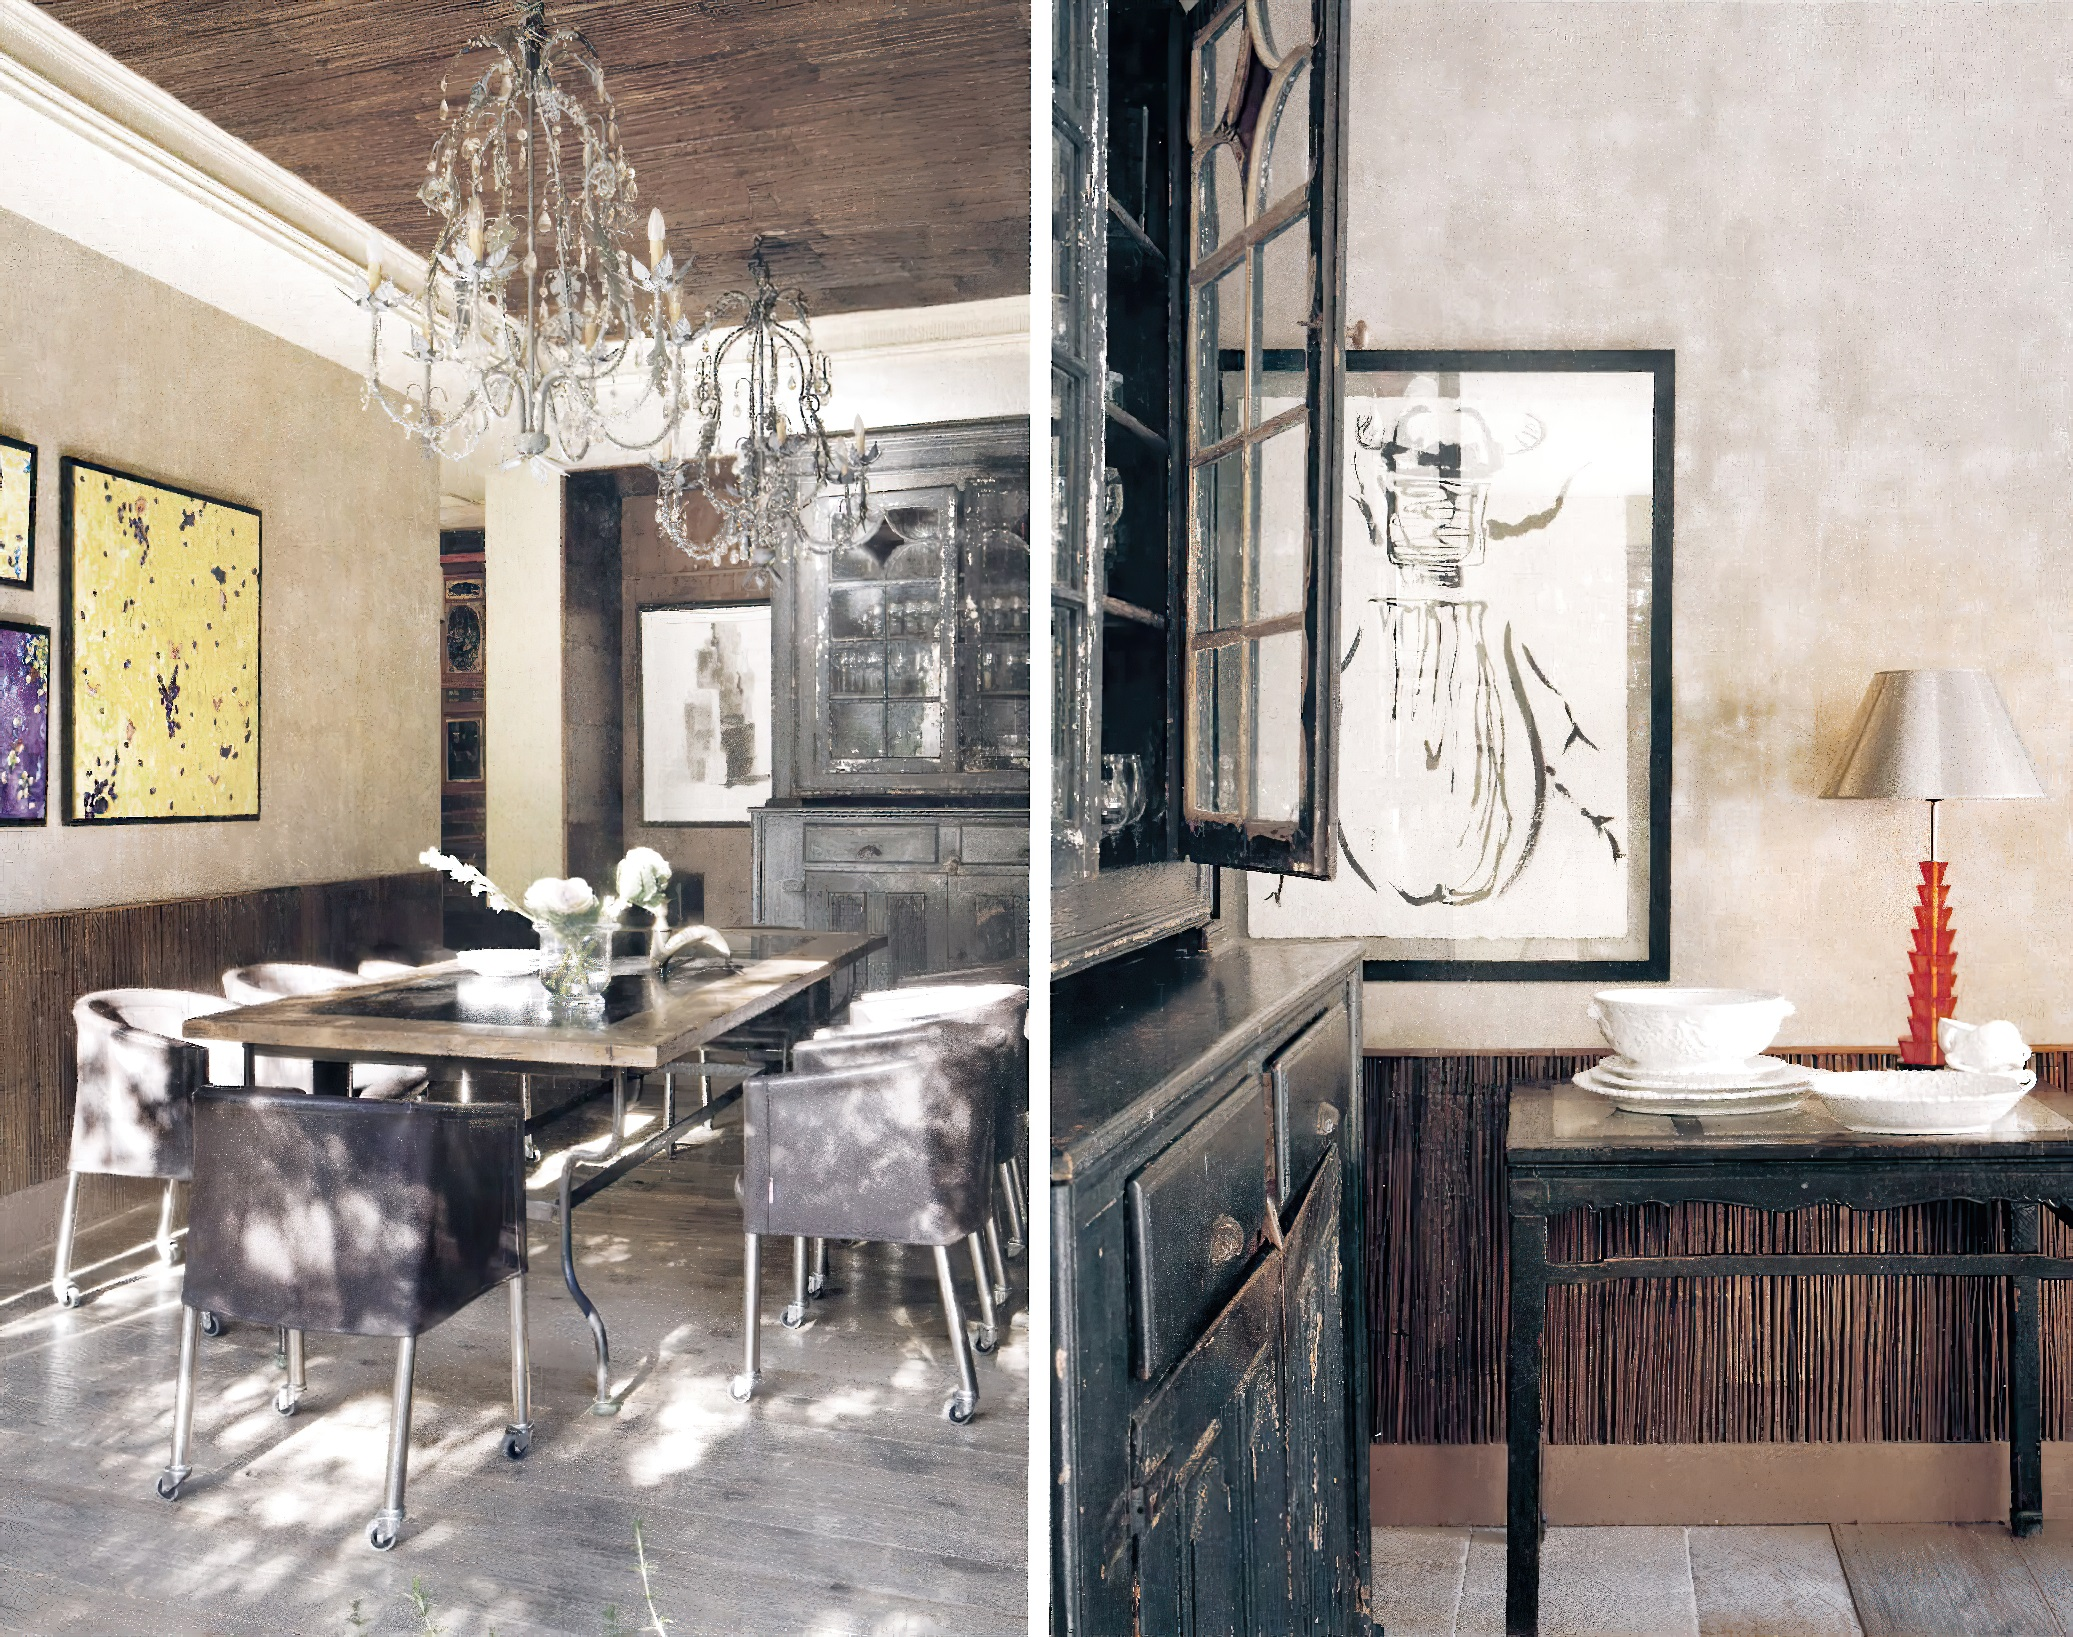 Casa Rodriguez Marin ATGestion estudio arquitectura Perfect Pixel Publicidad Edited